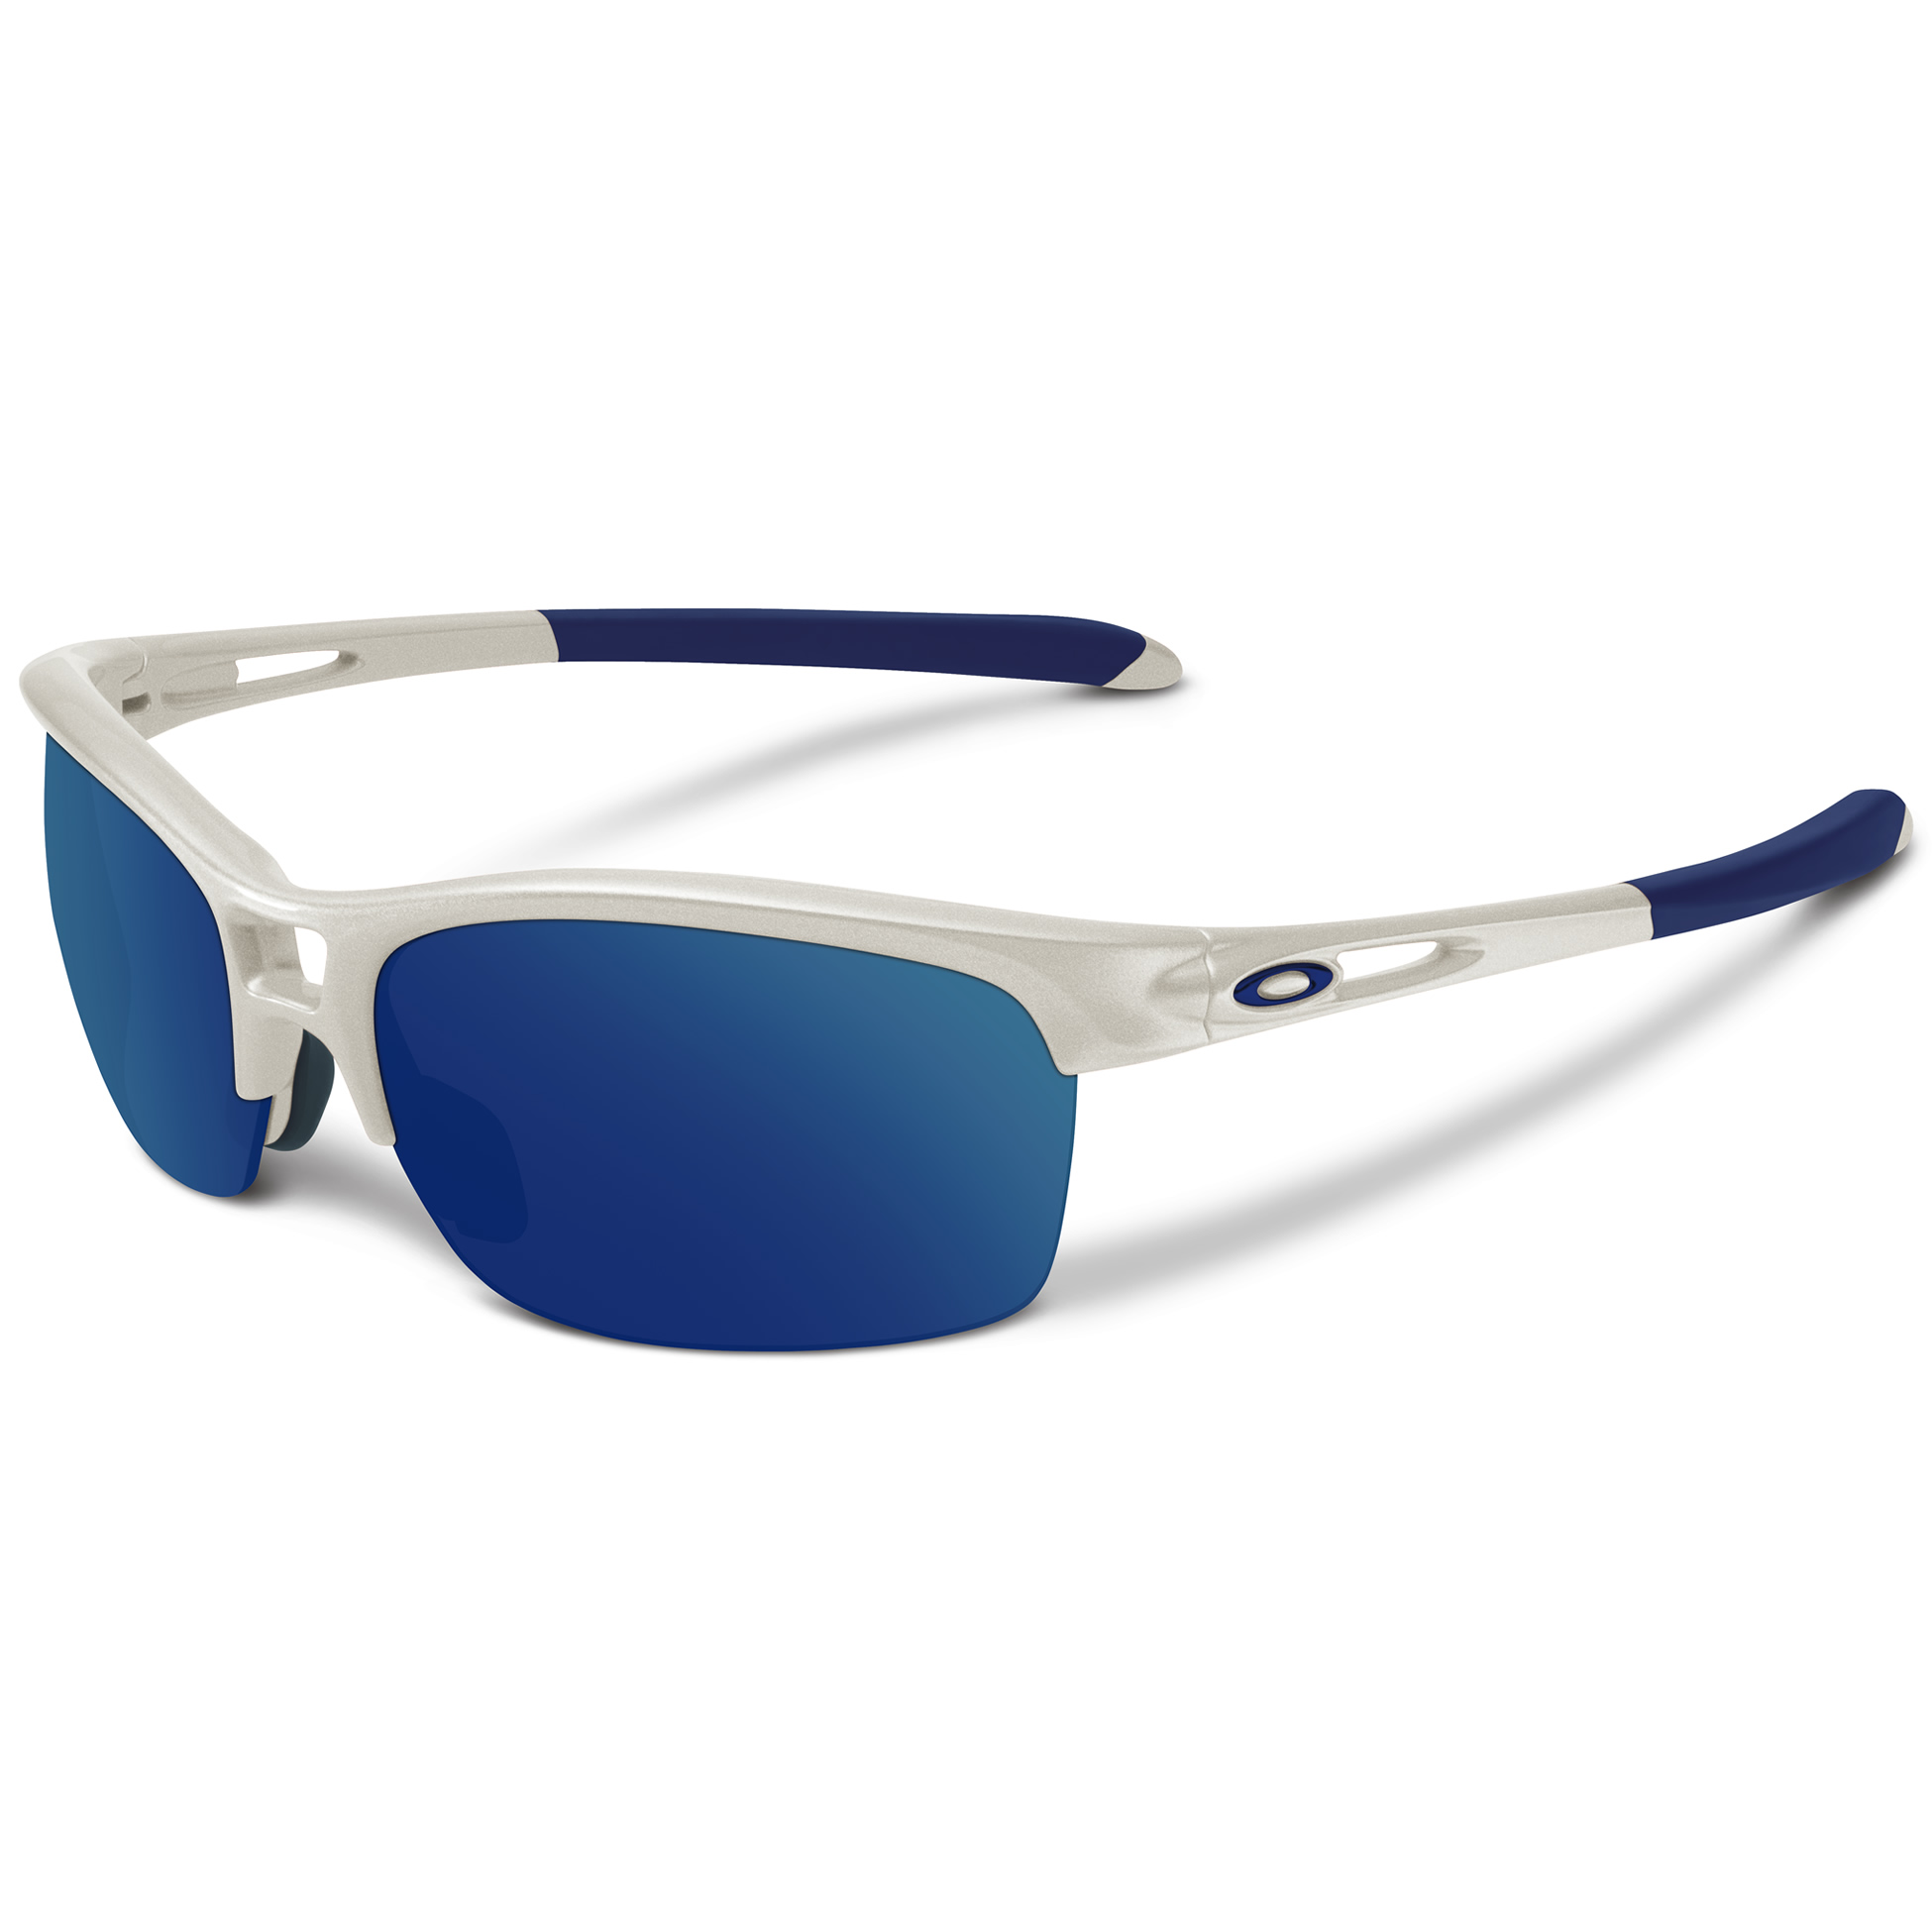 a642d5ed2d Oakley Sunglasses Retailers Uk « Heritage Malta